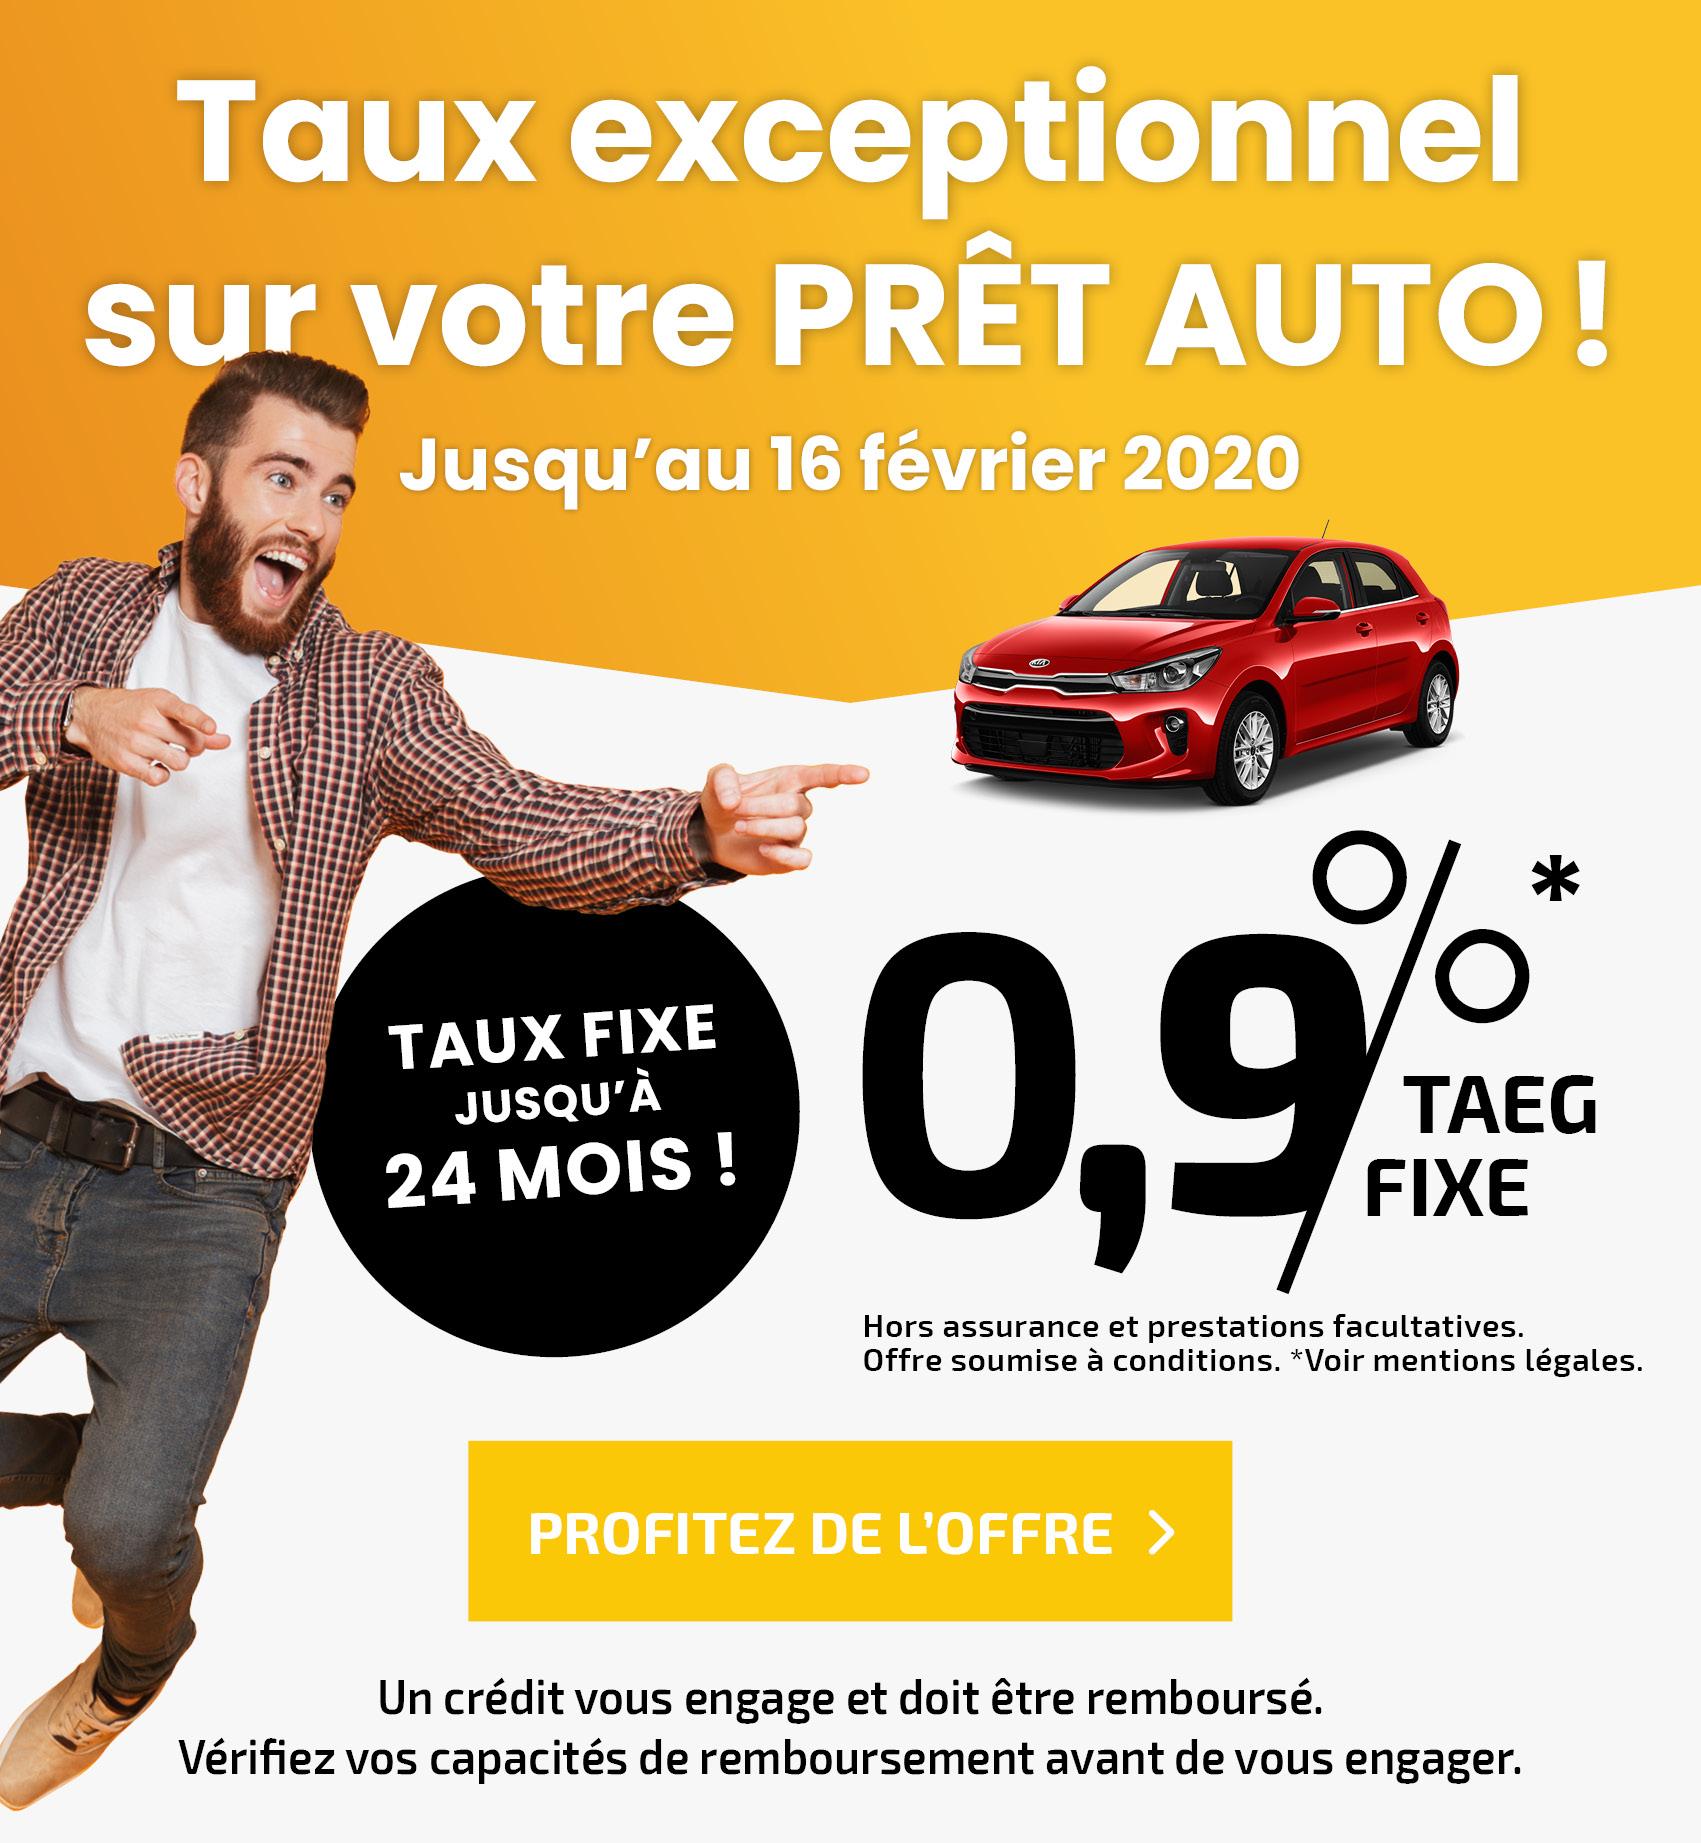 Calcul Financement Auto >> Credit Voiture Occasion Simulation Financement Pret Auto